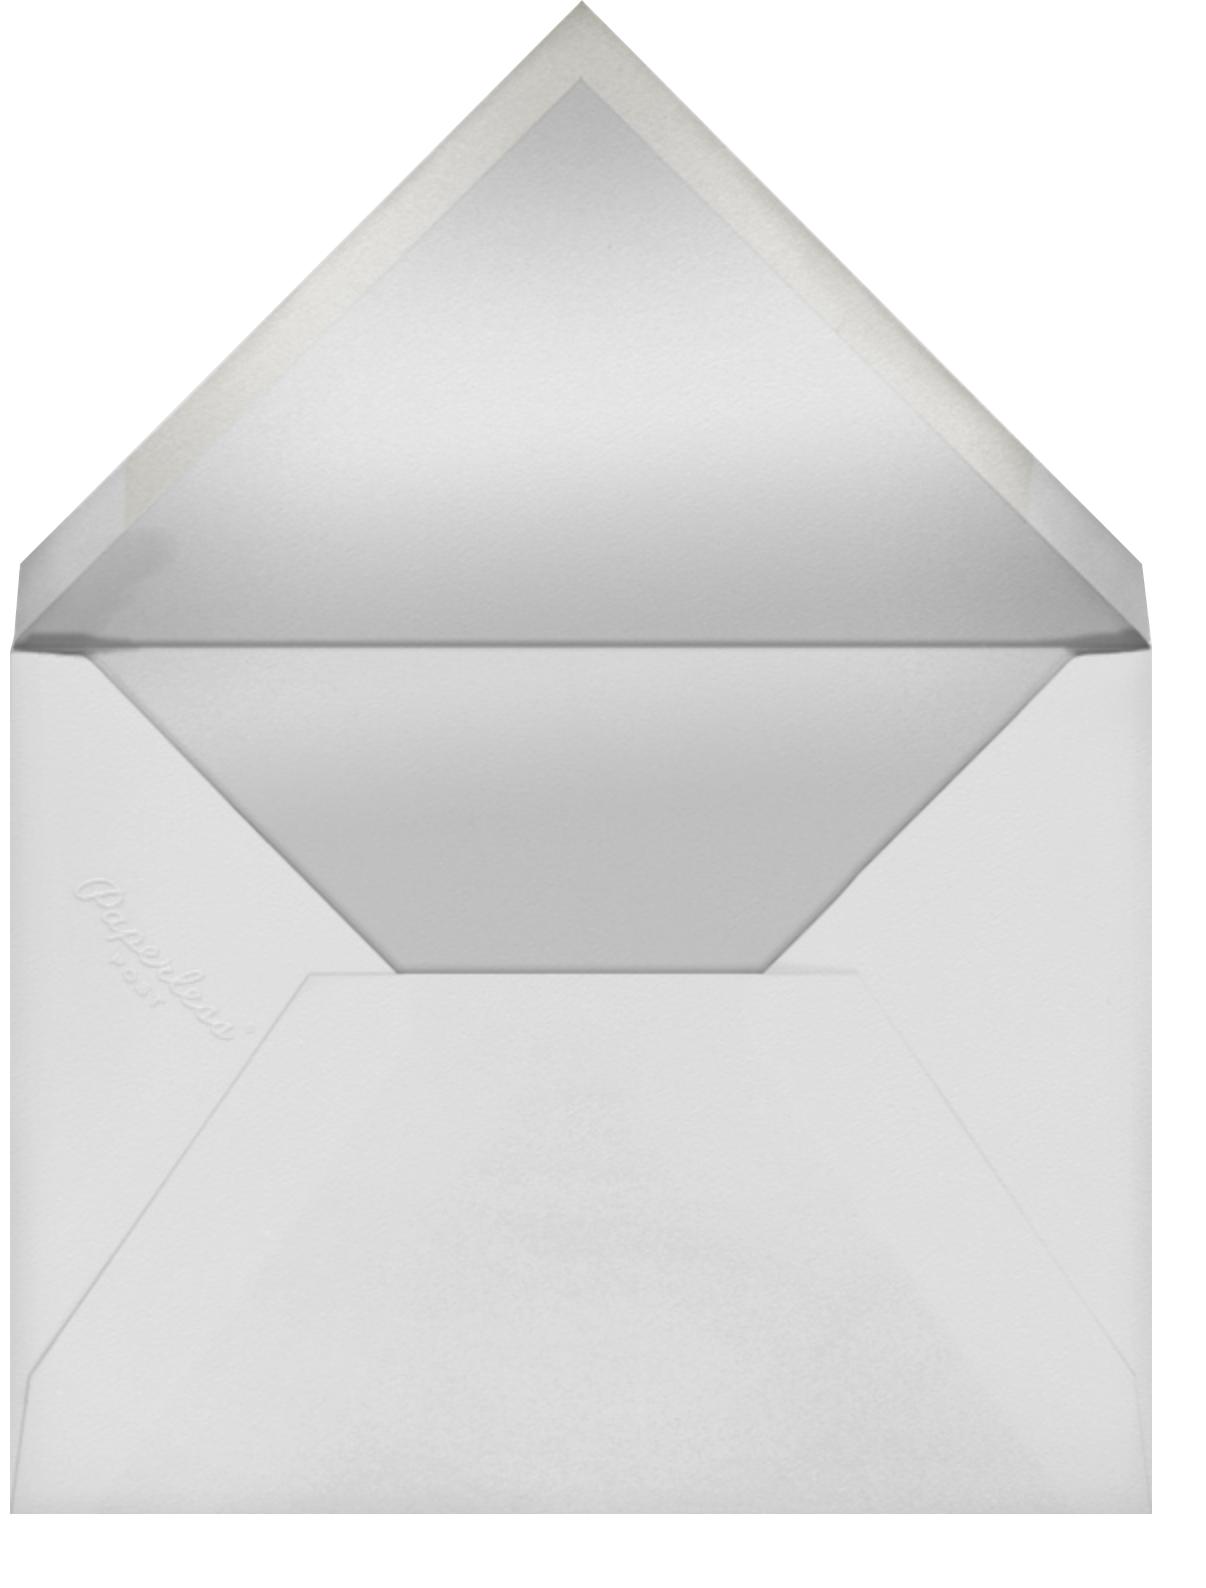 Malacca (Program) - Paperless Post - Envelope